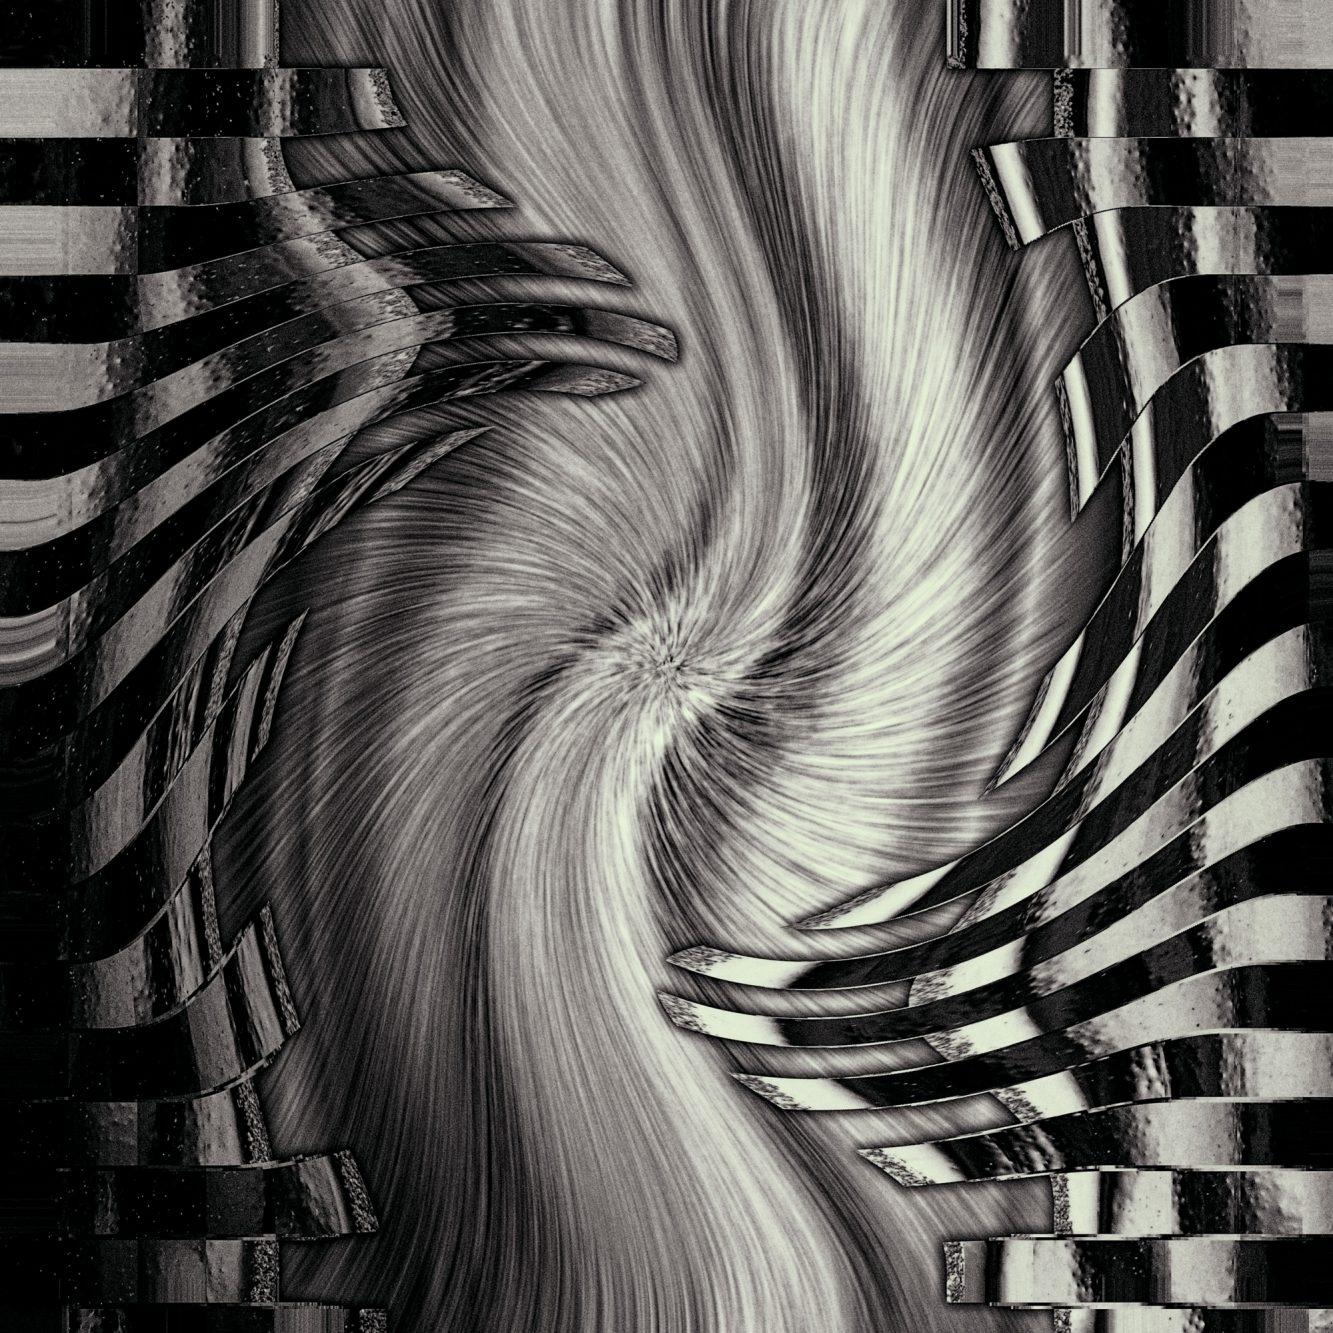 glass-photo-art-5648-bewerkt